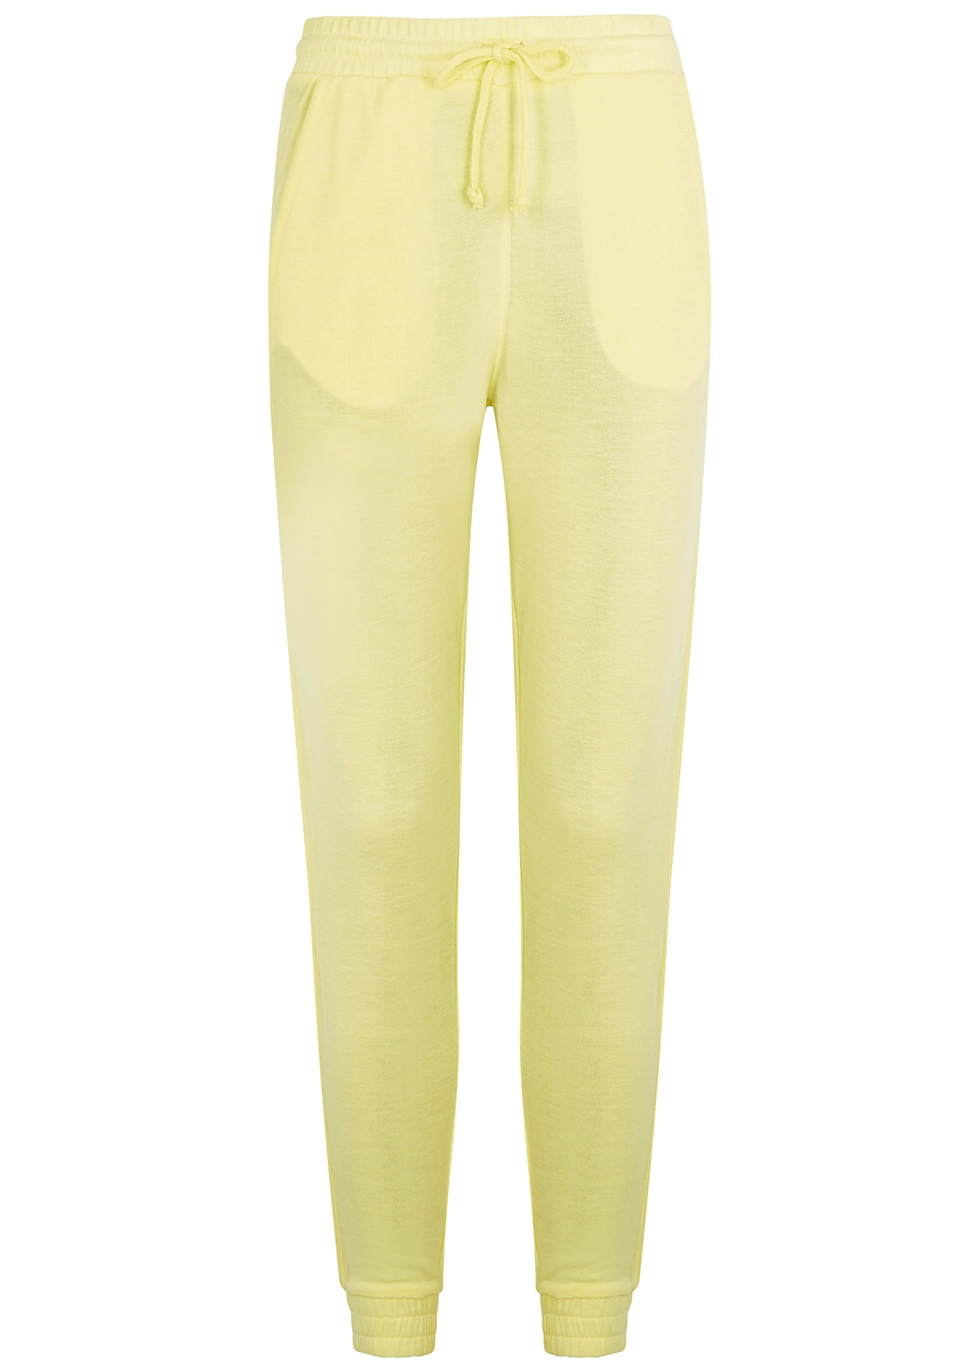 Back Into It yellow modal-blend sweatpants